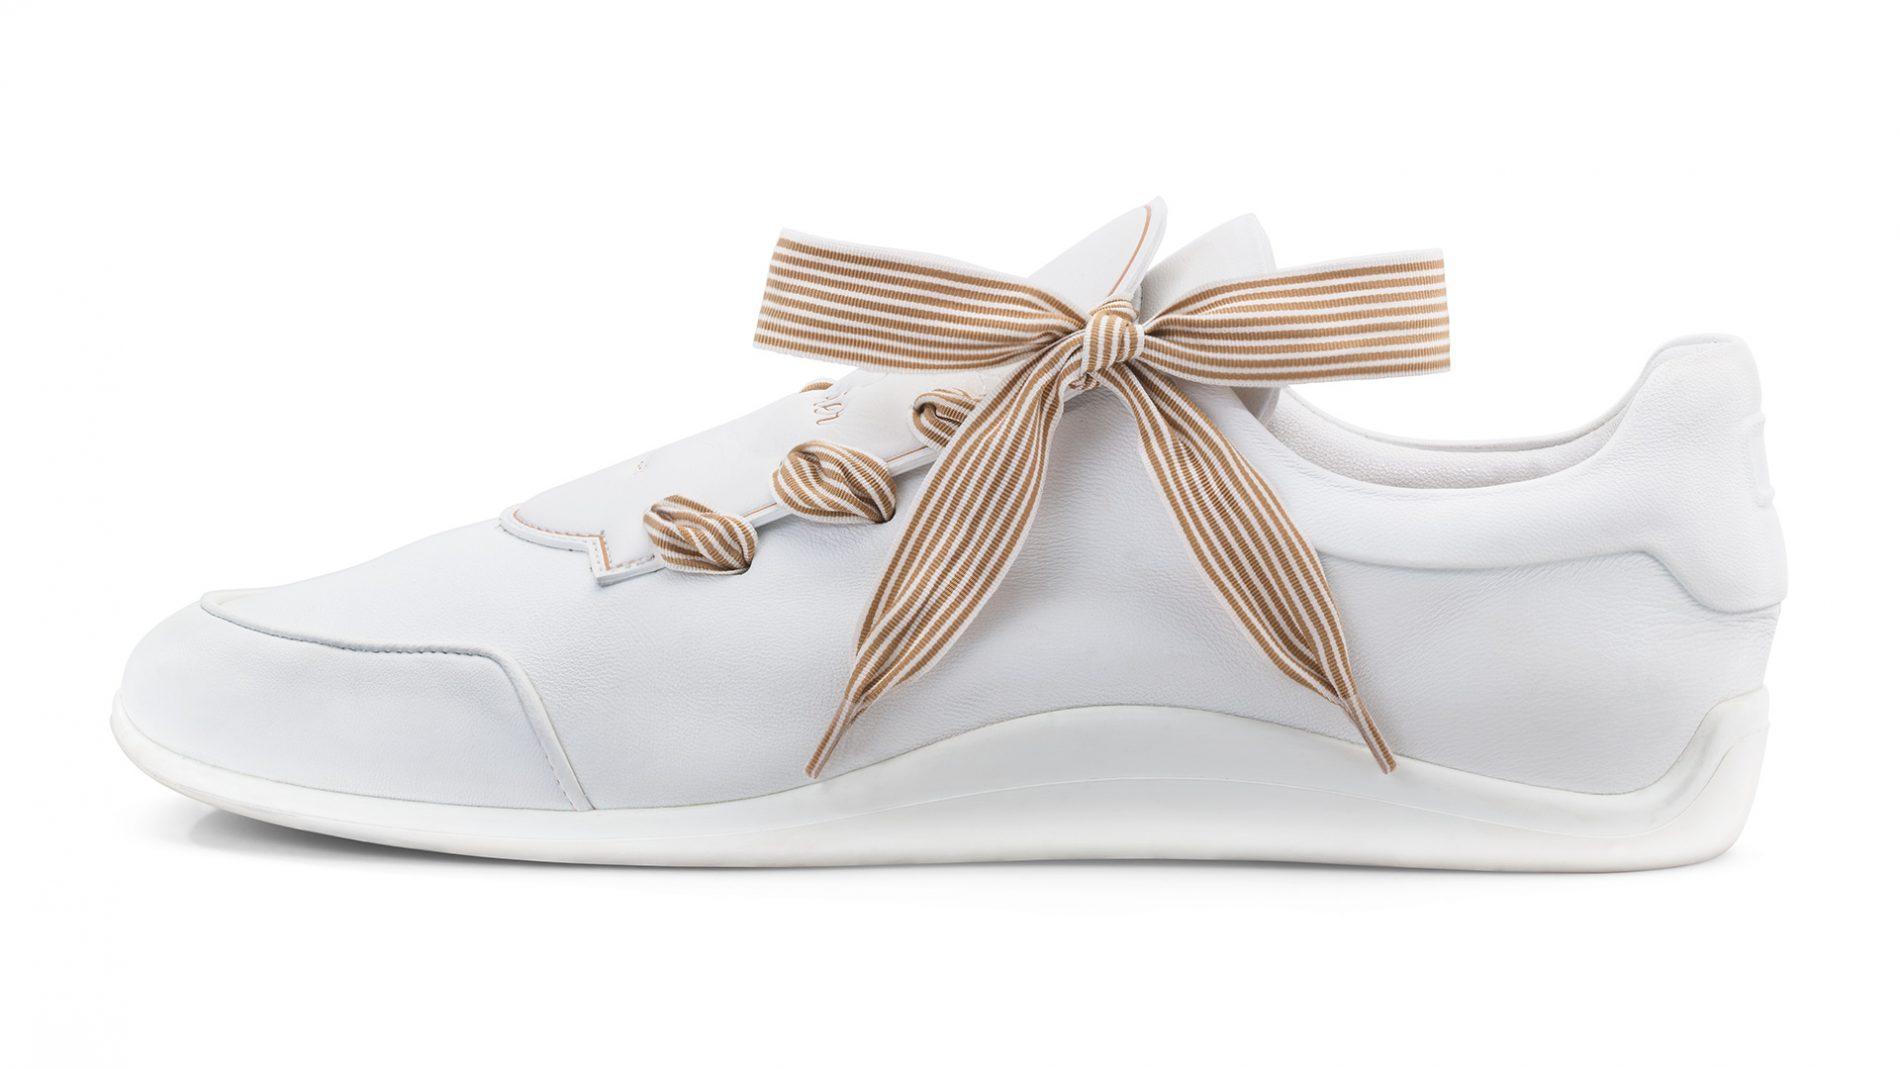 El Corte Inglés Designer Shoes Roger Vivier Sneakers